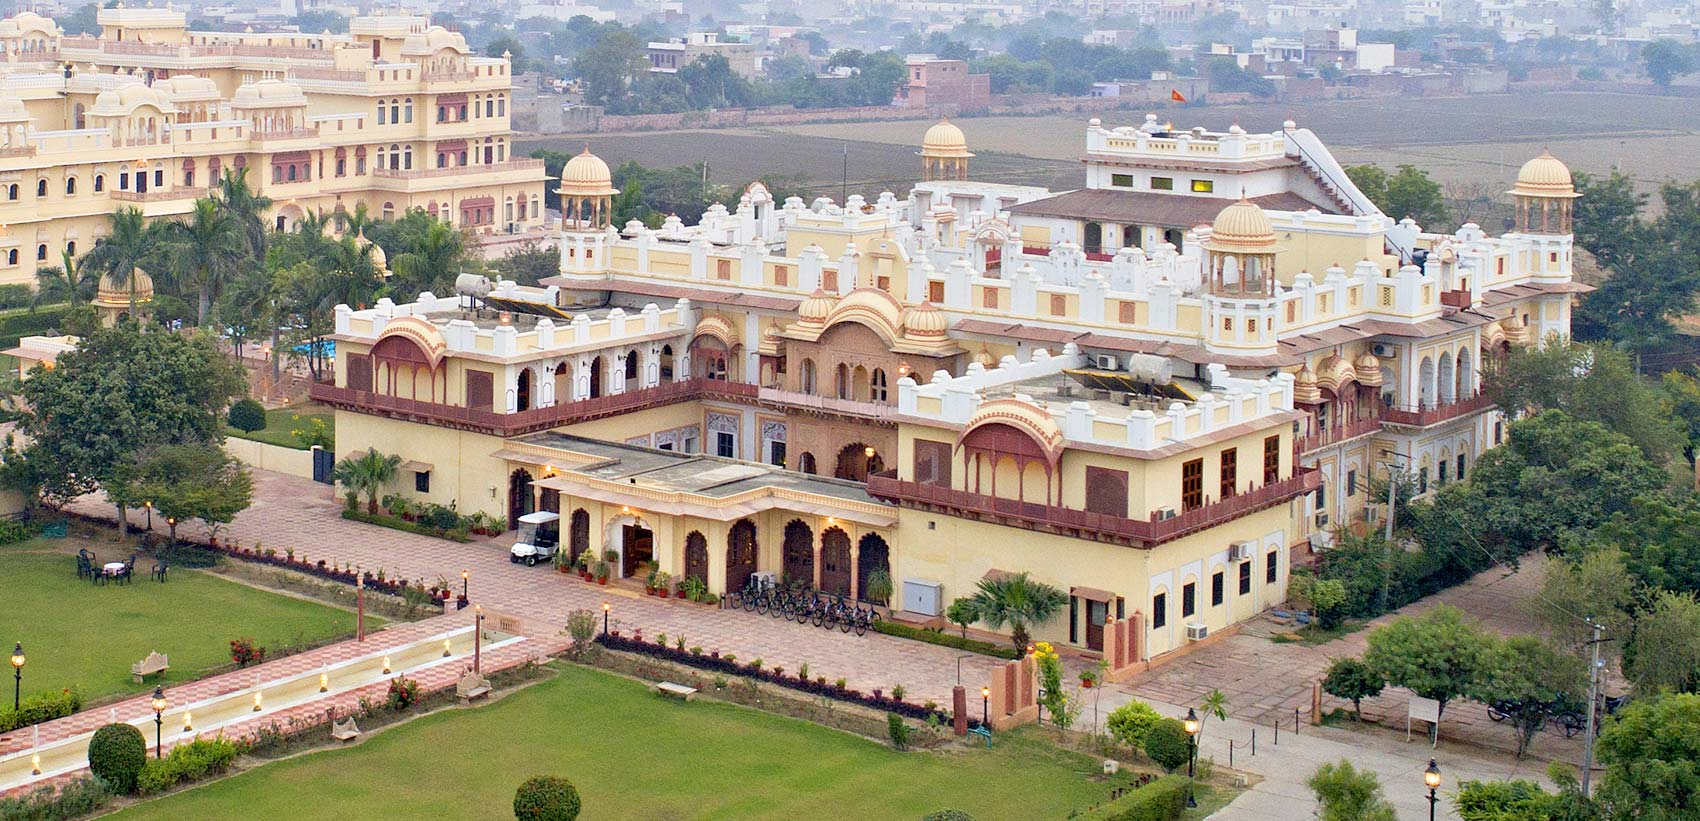 Laxmi Villas Palace, Bharatpur